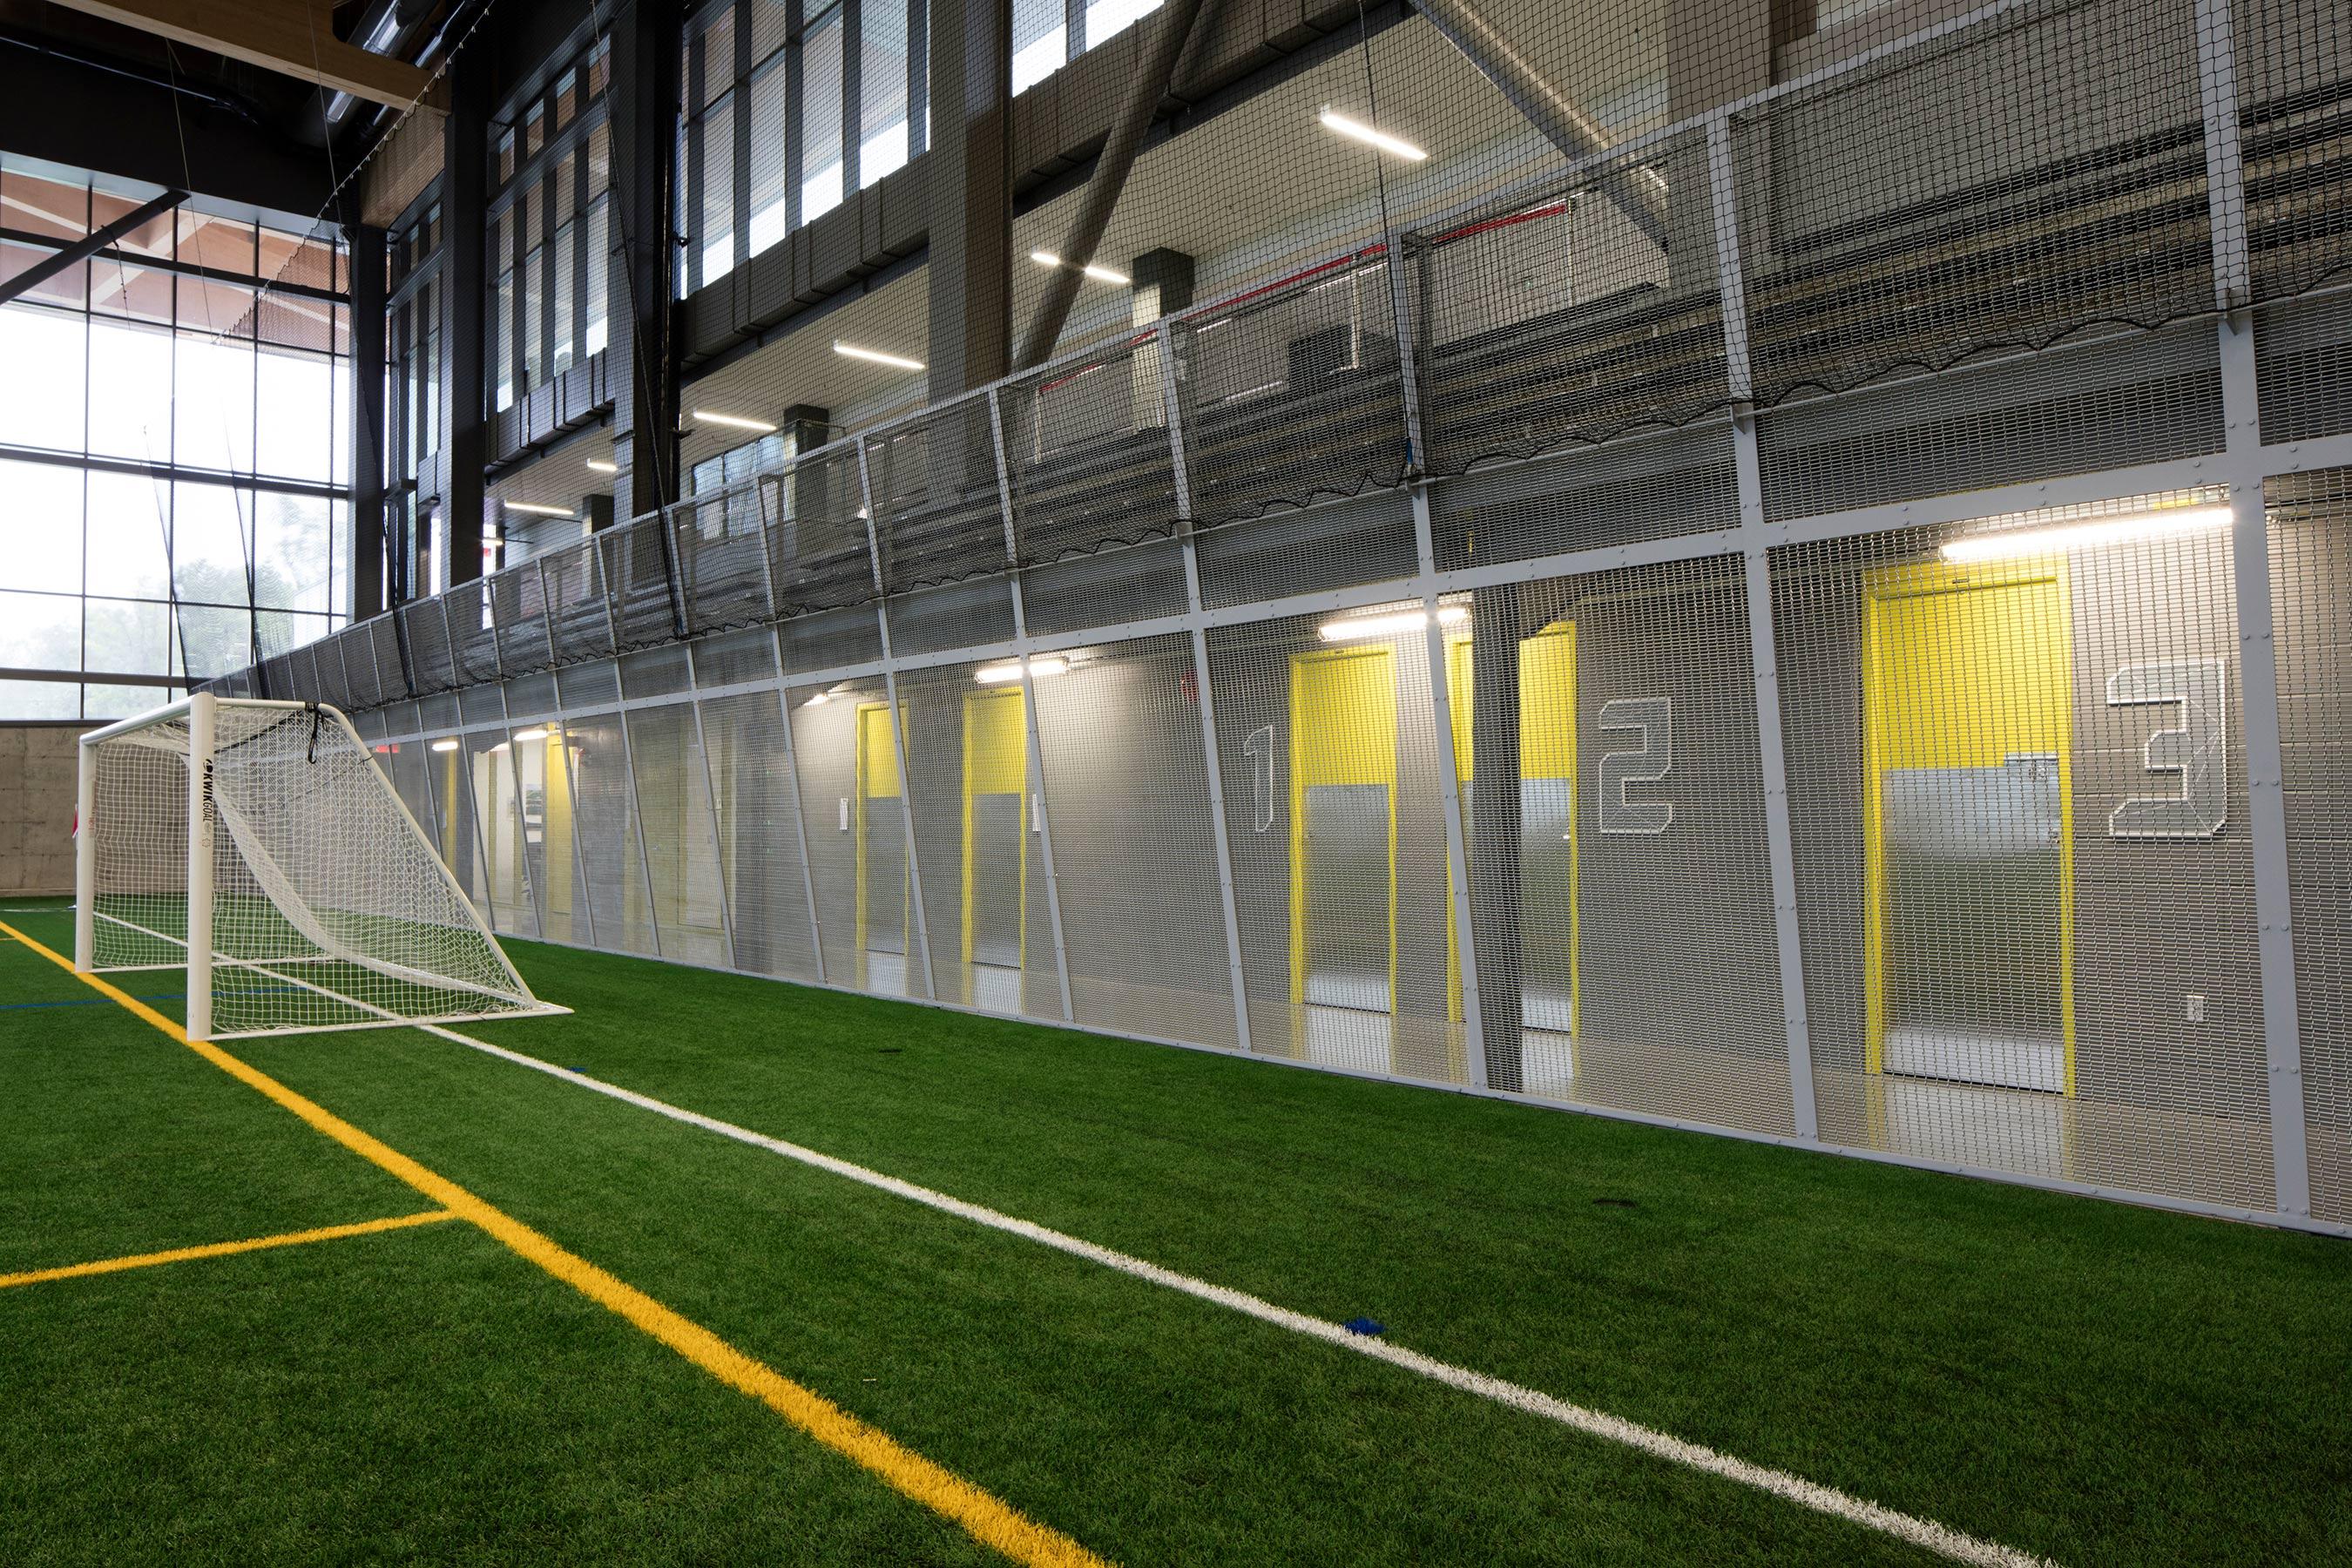 Stade de Soccer de Montréal using M12Z-17 as a safety enclosure and railing